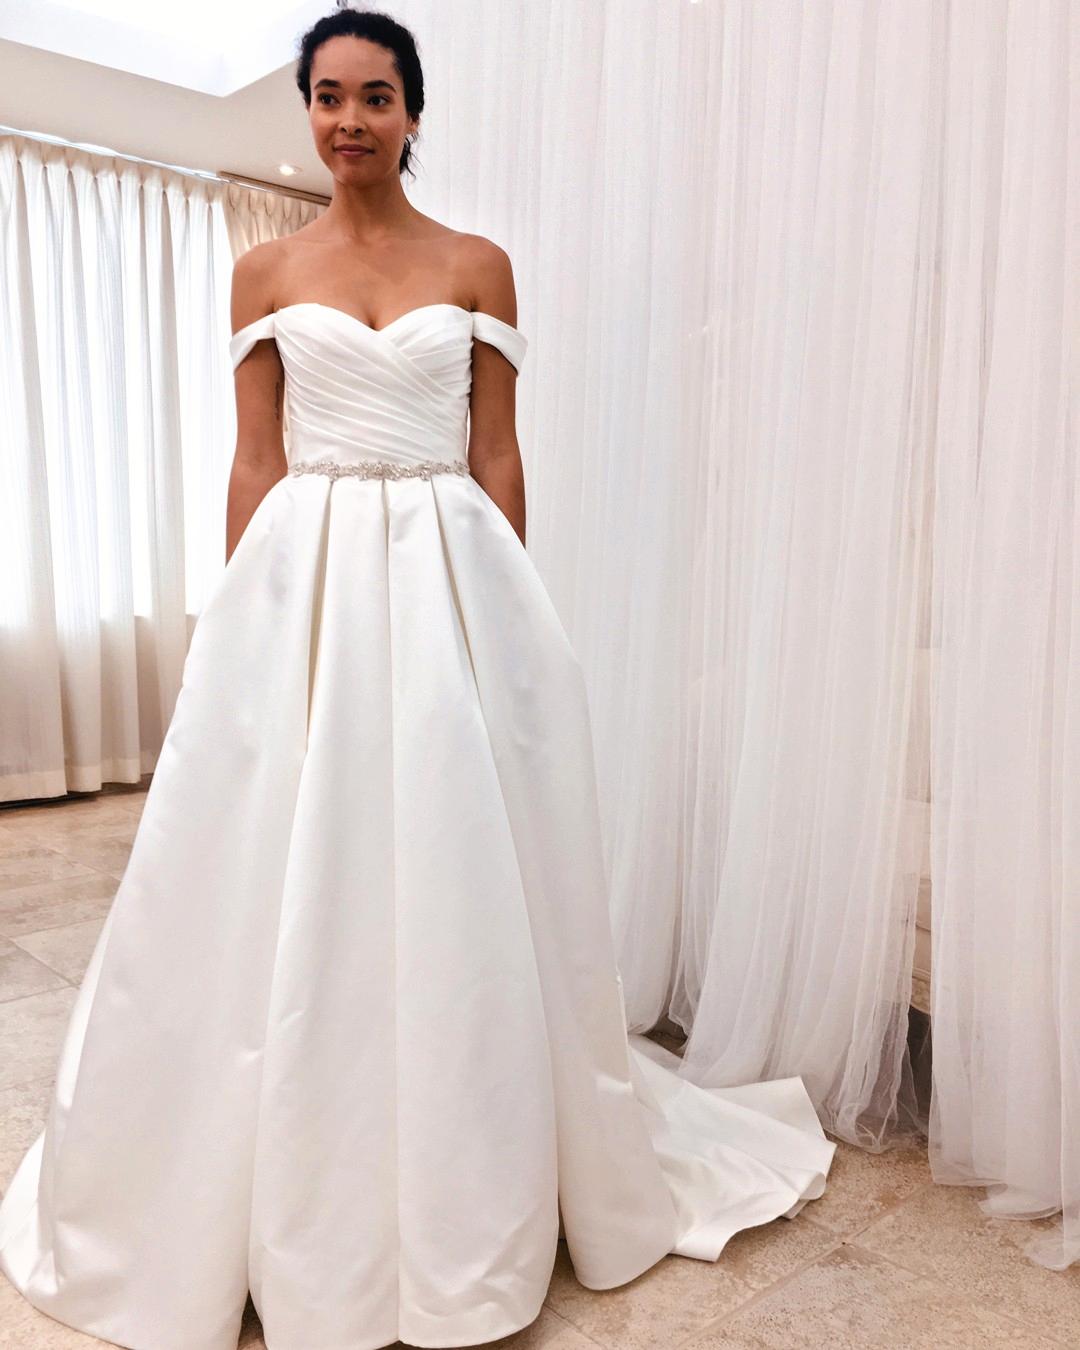 Draped Sleeve Ball Gown Wedding Dress Style 2243 Mikaella